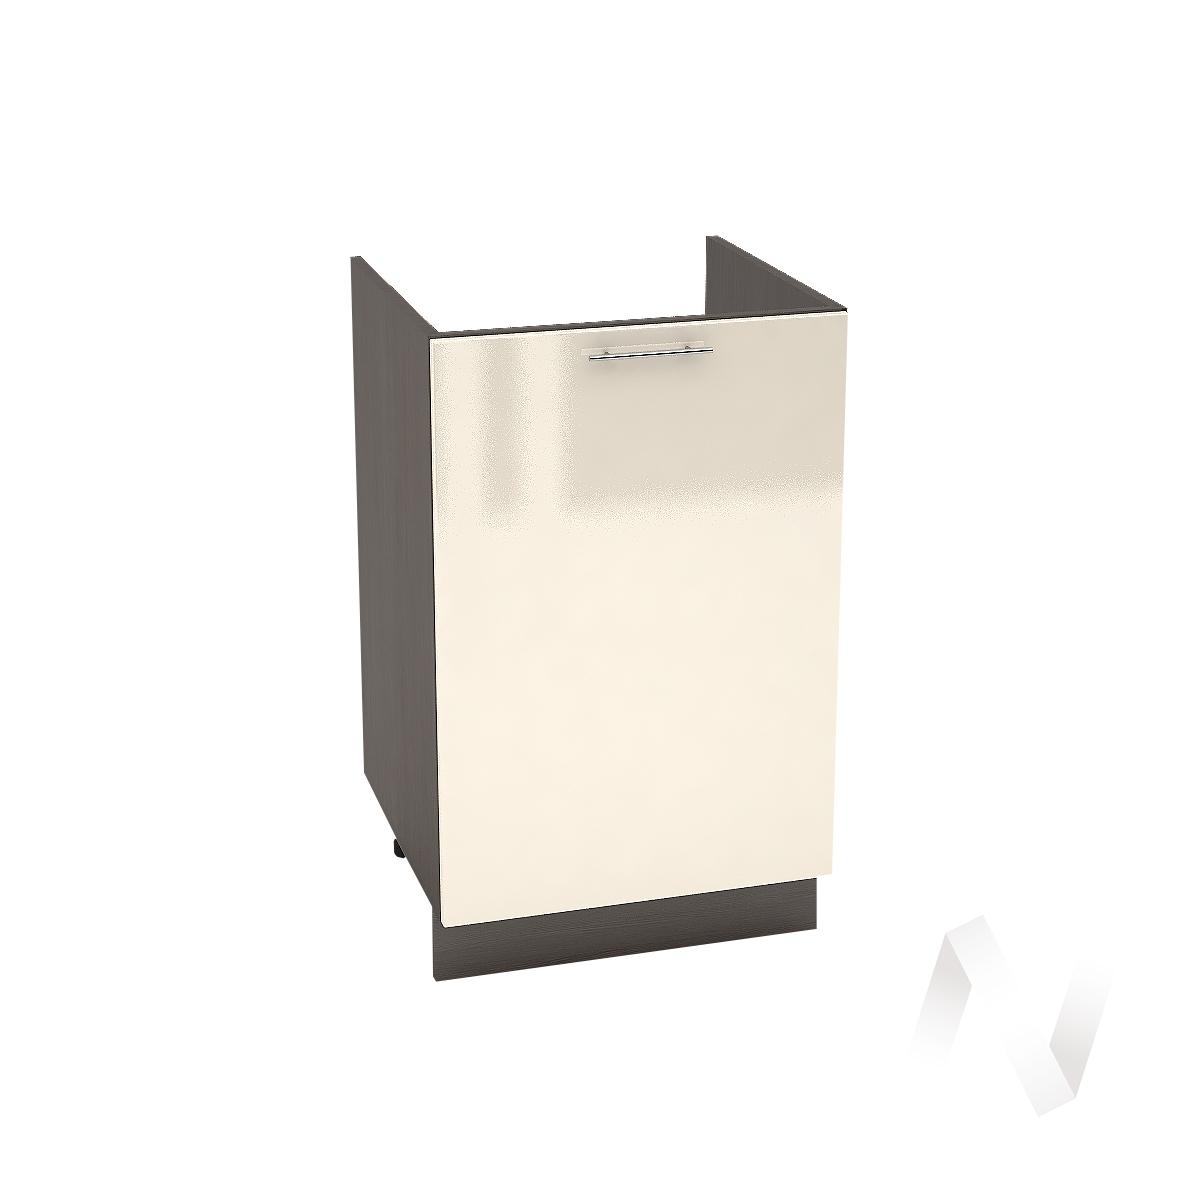 "Кухня ""Валерия-М"": Шкаф нижний под мойку 500, ШНМ 500 (Ваниль глянец/корпус венге)"